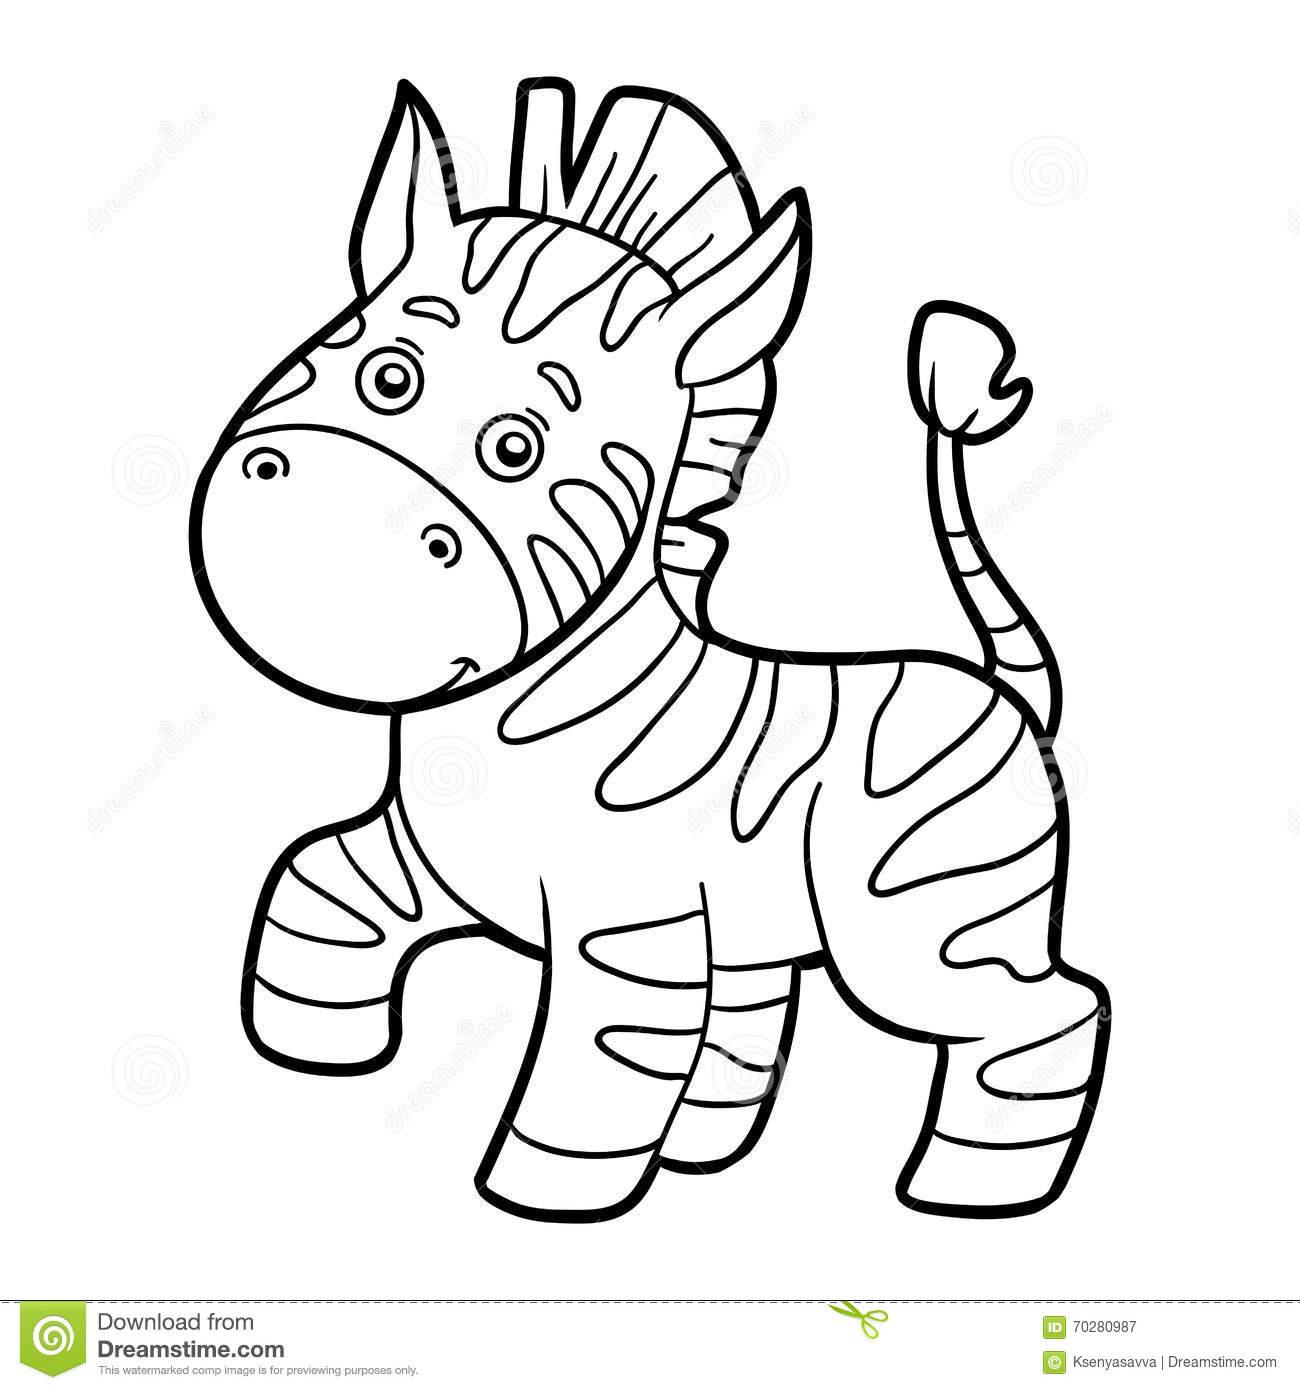 baby zebra coloring pages baby zebra coloring pages getcoloringpagescom coloring pages zebra baby